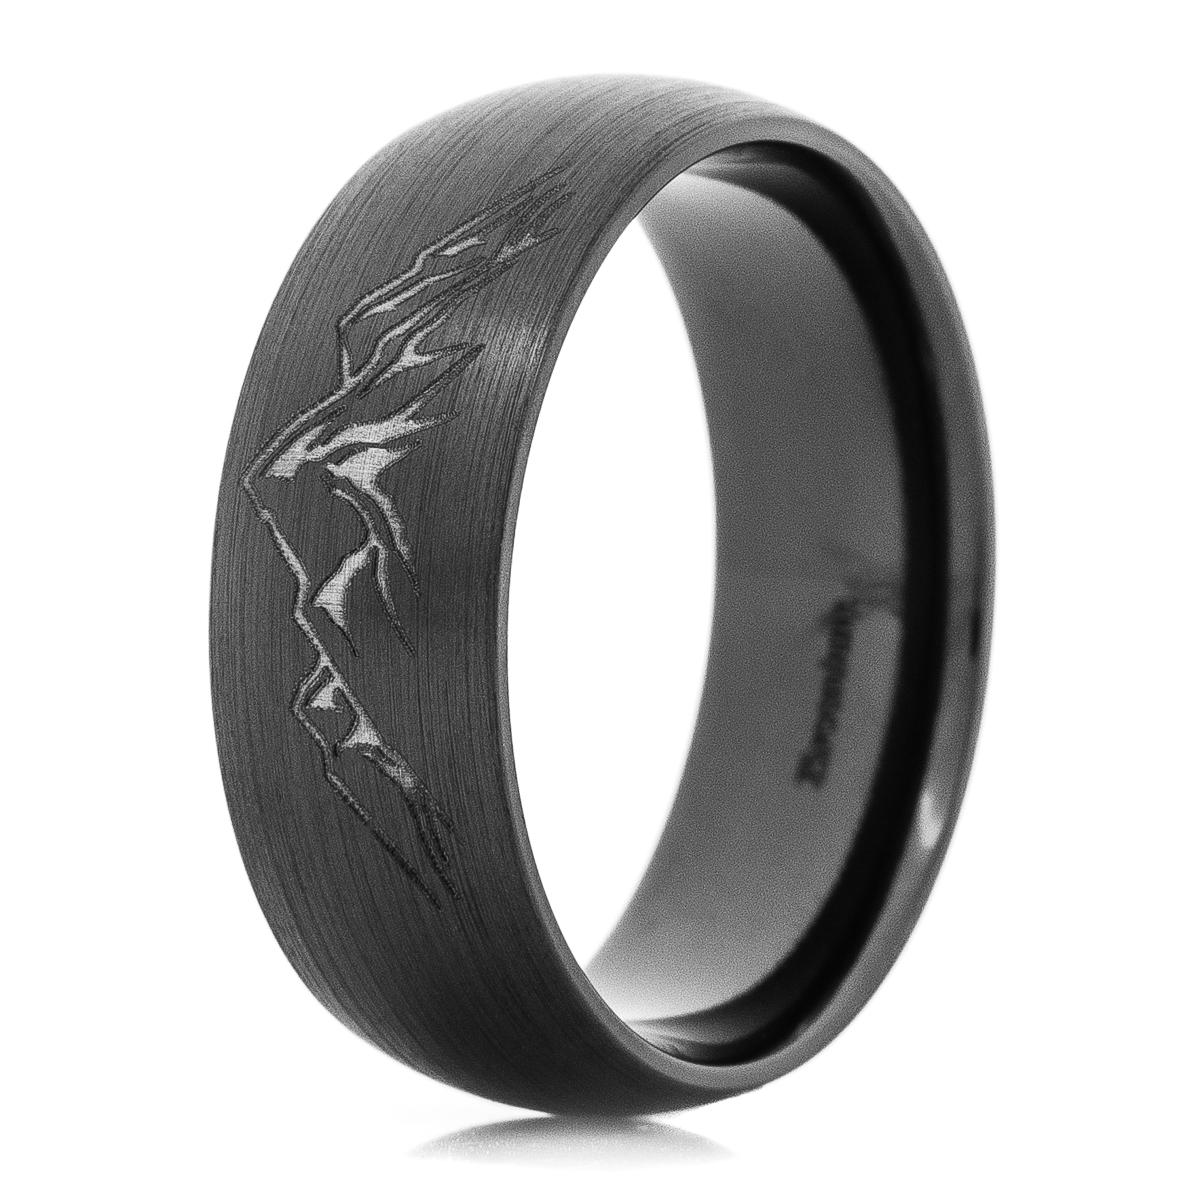 Men's Black Zirconium Carved Mountain Ring